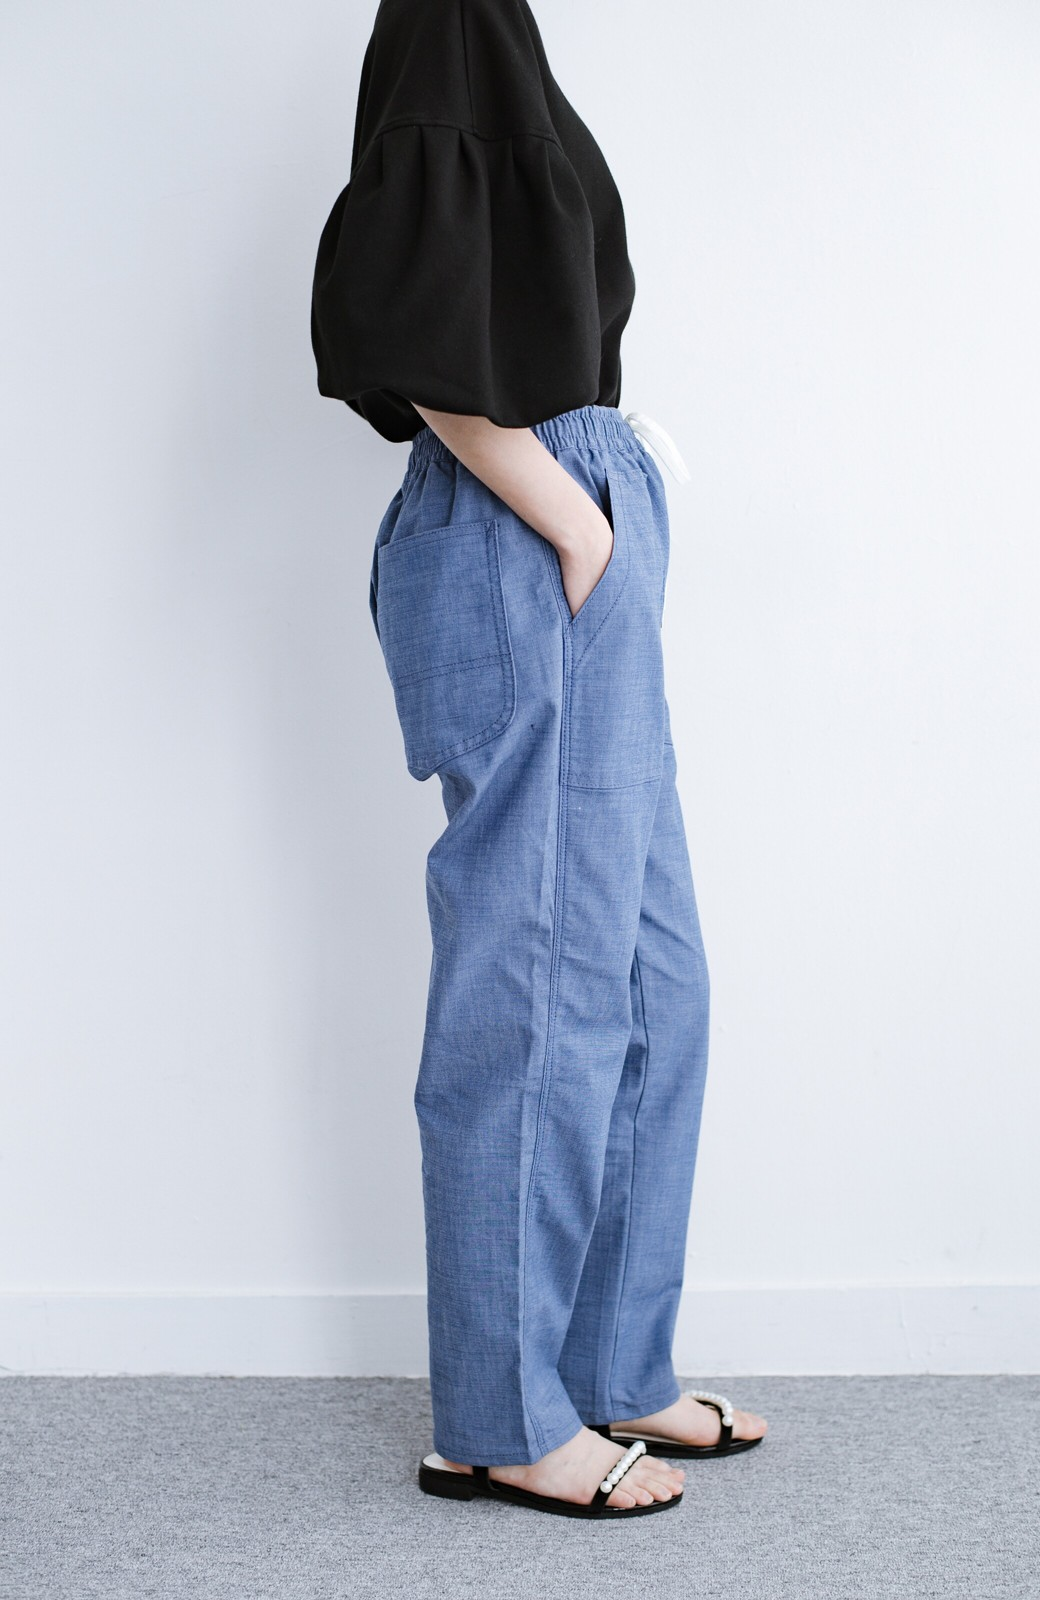 haco! Lady Lee シャンブレー素材のらくちんイージーパンツ <ブルー>の商品写真3